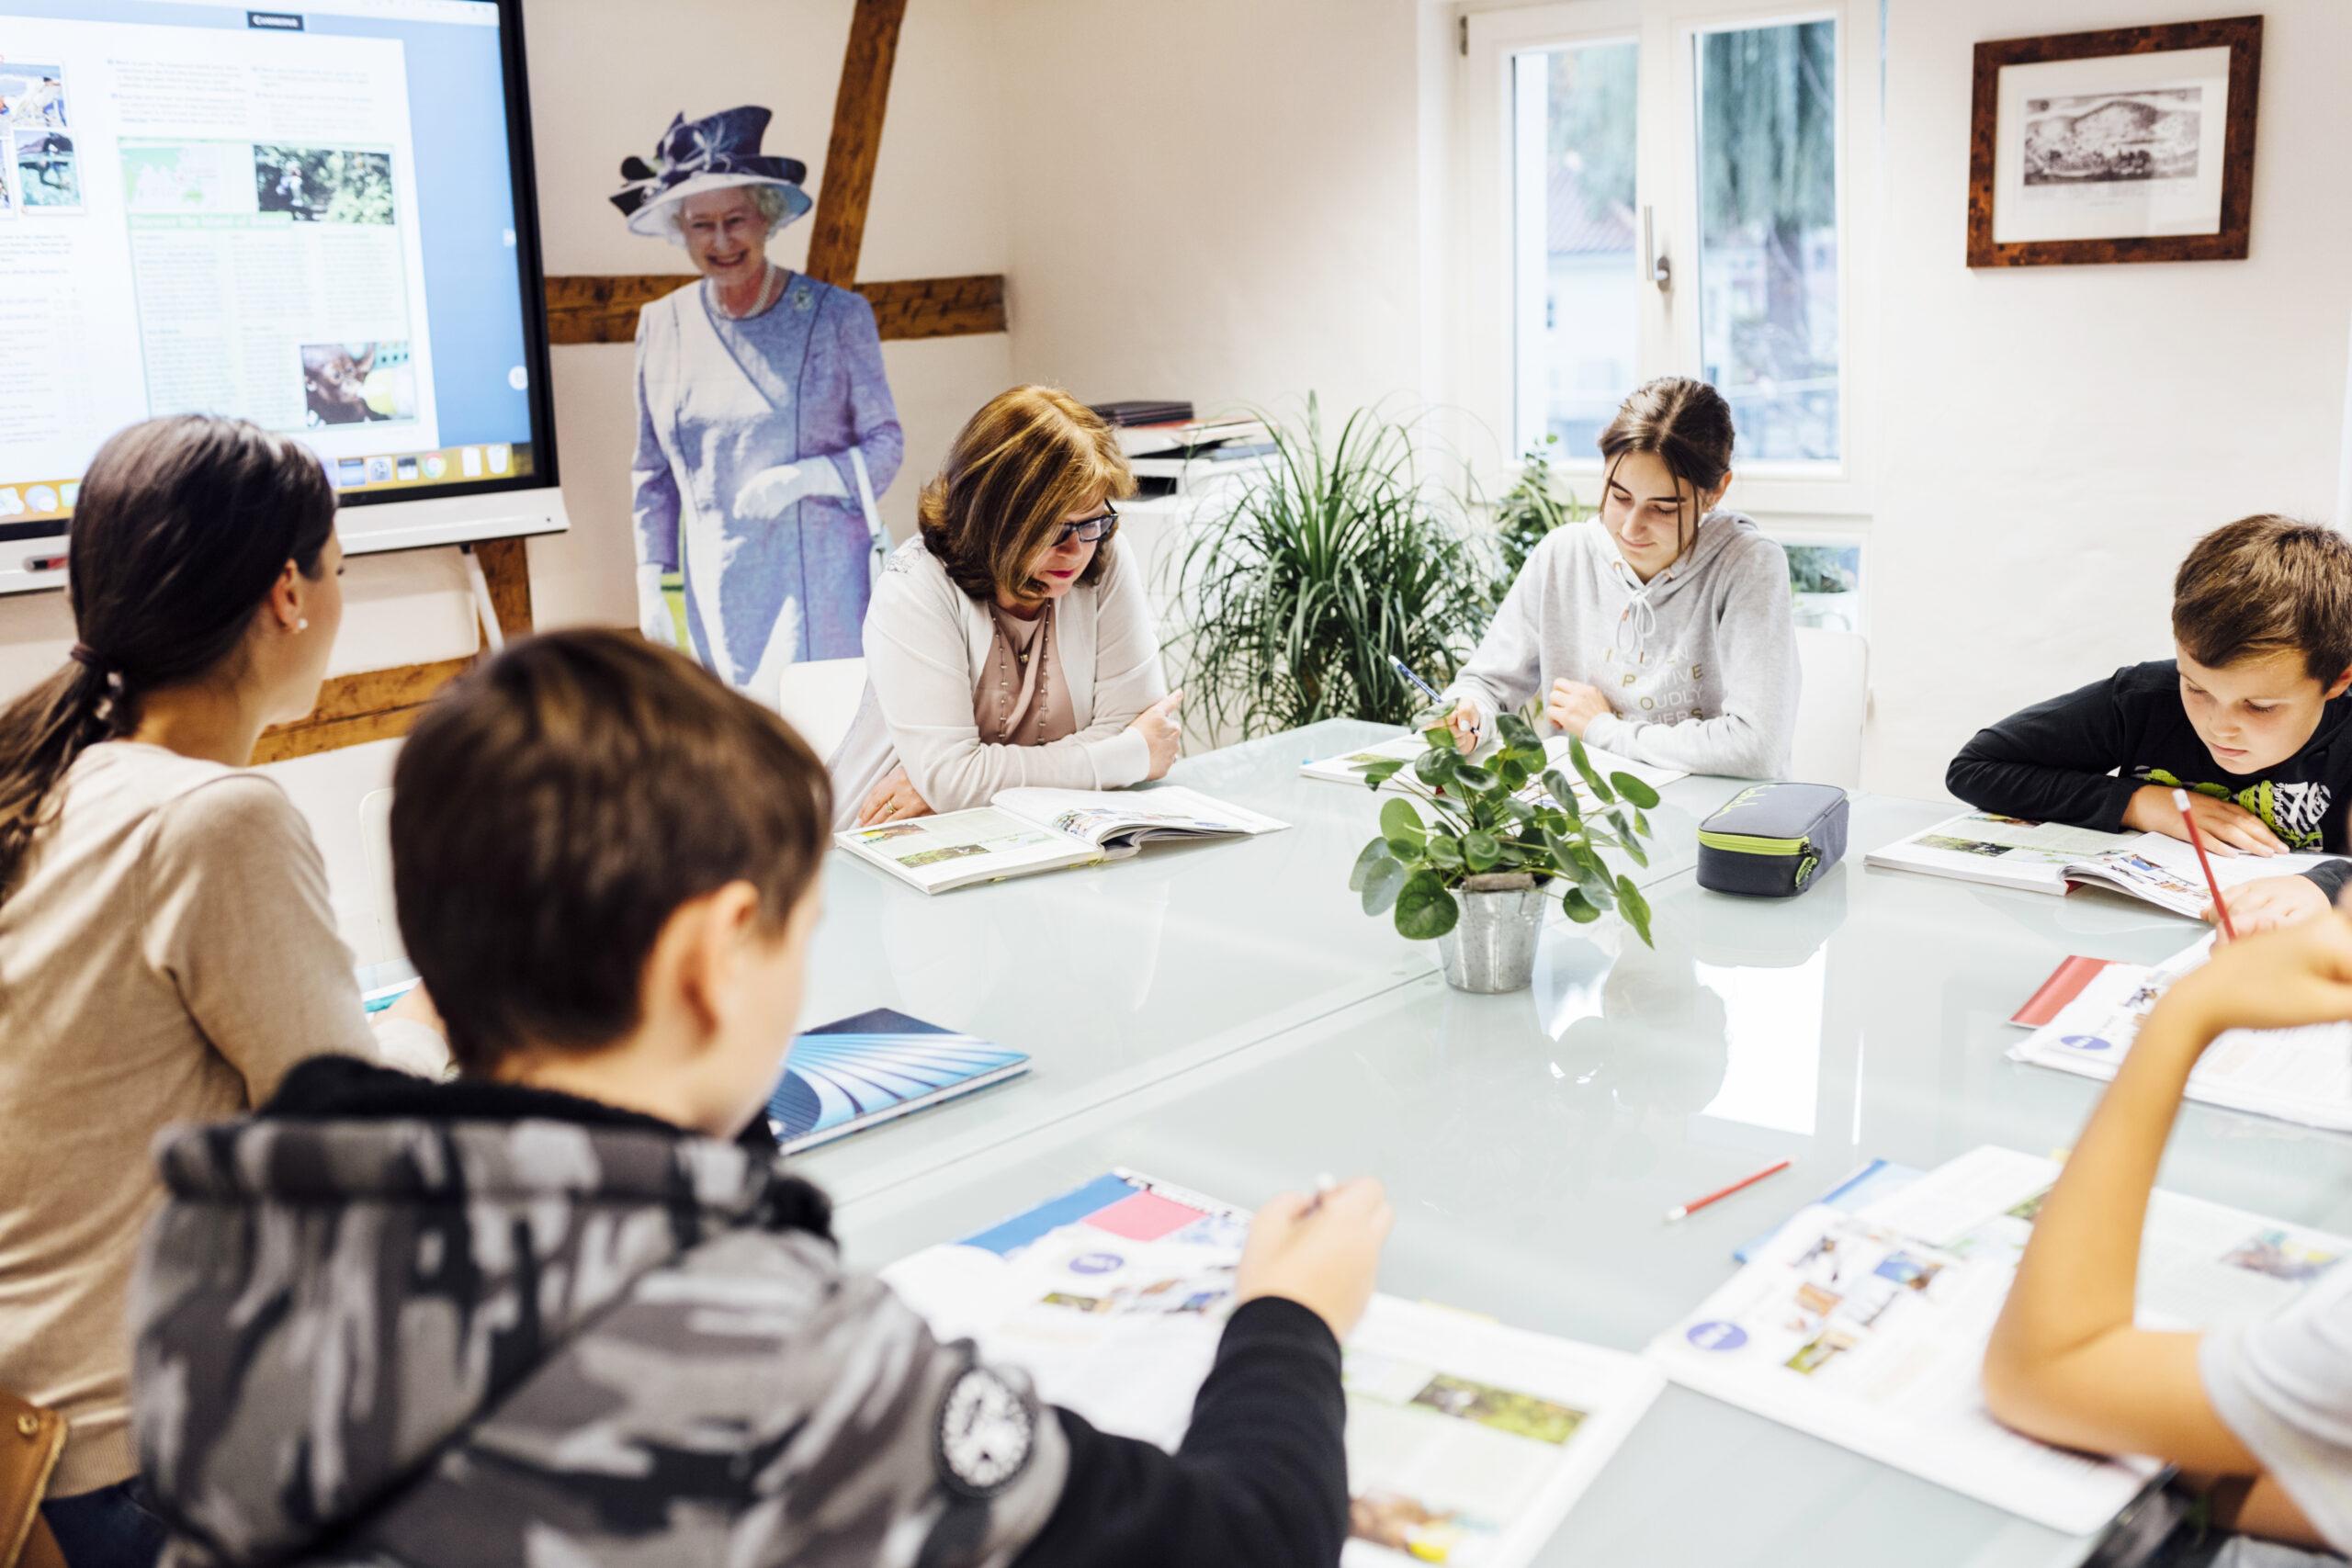 Gruppenunterricht